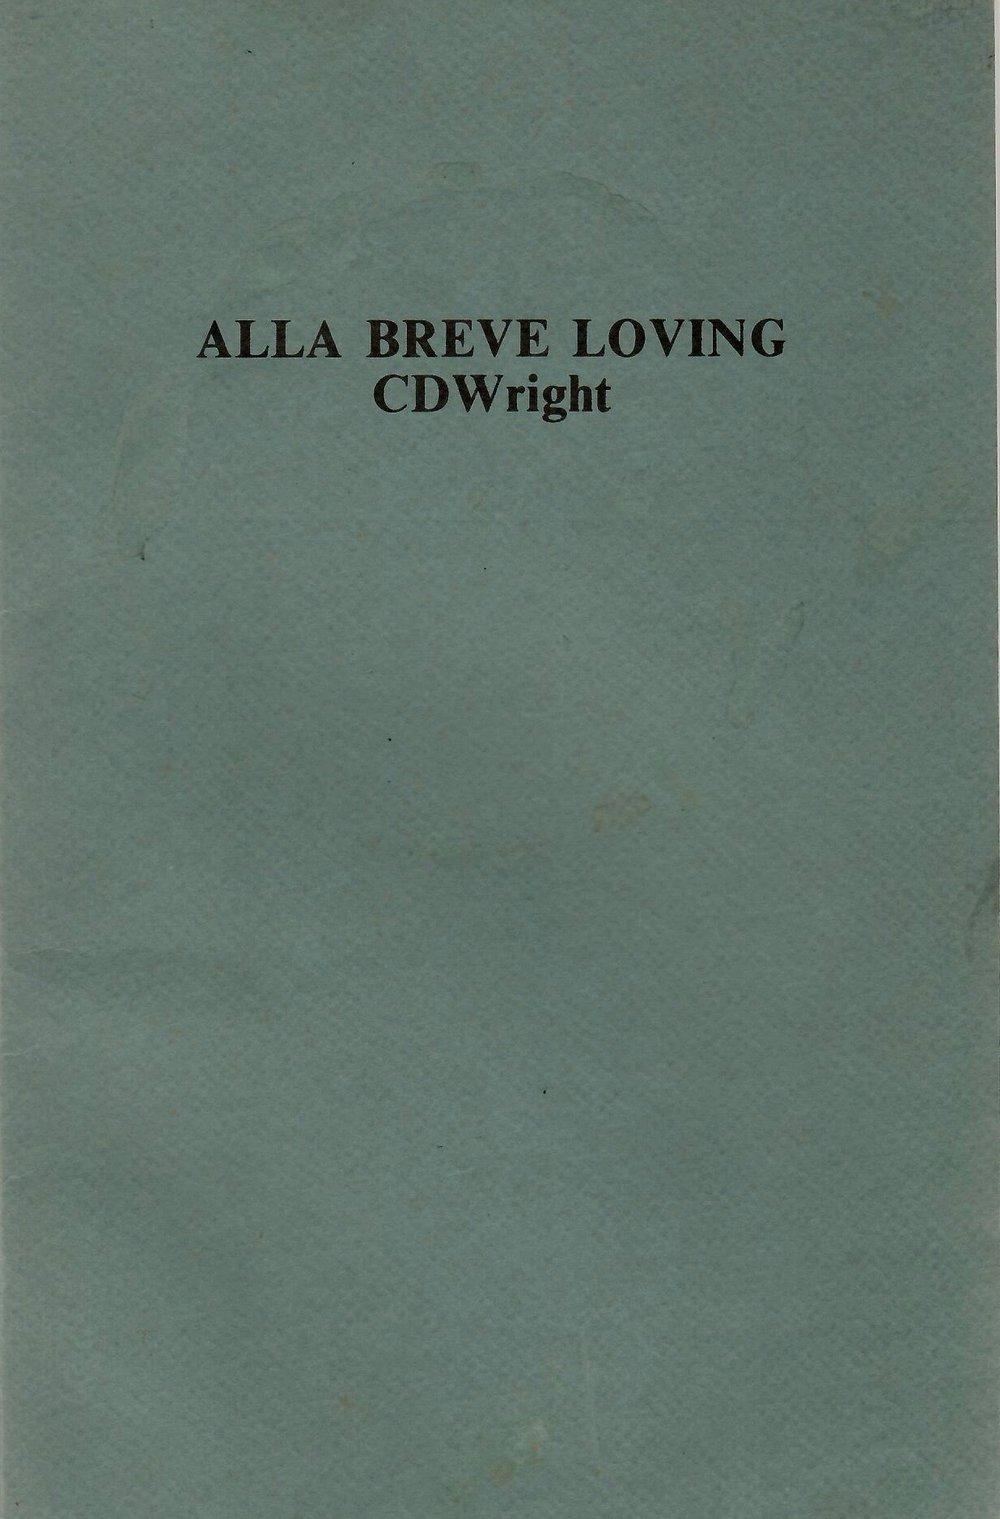 Mill Mountain Press, 1976